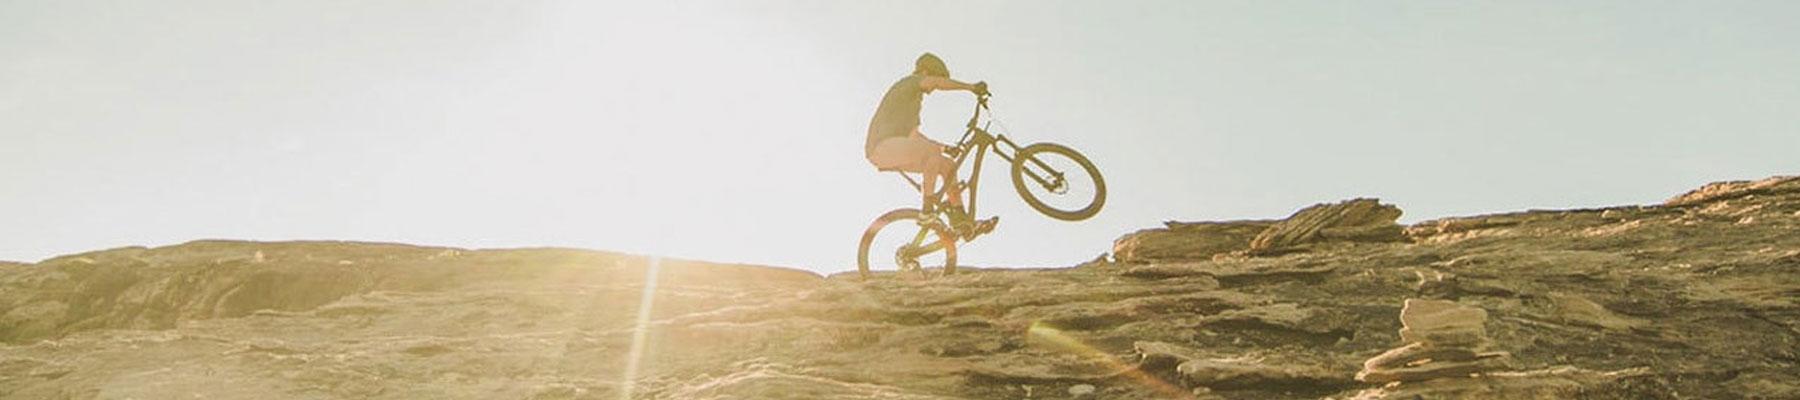 Kulkea Bike Products - Person Mountain Biking in the Sun